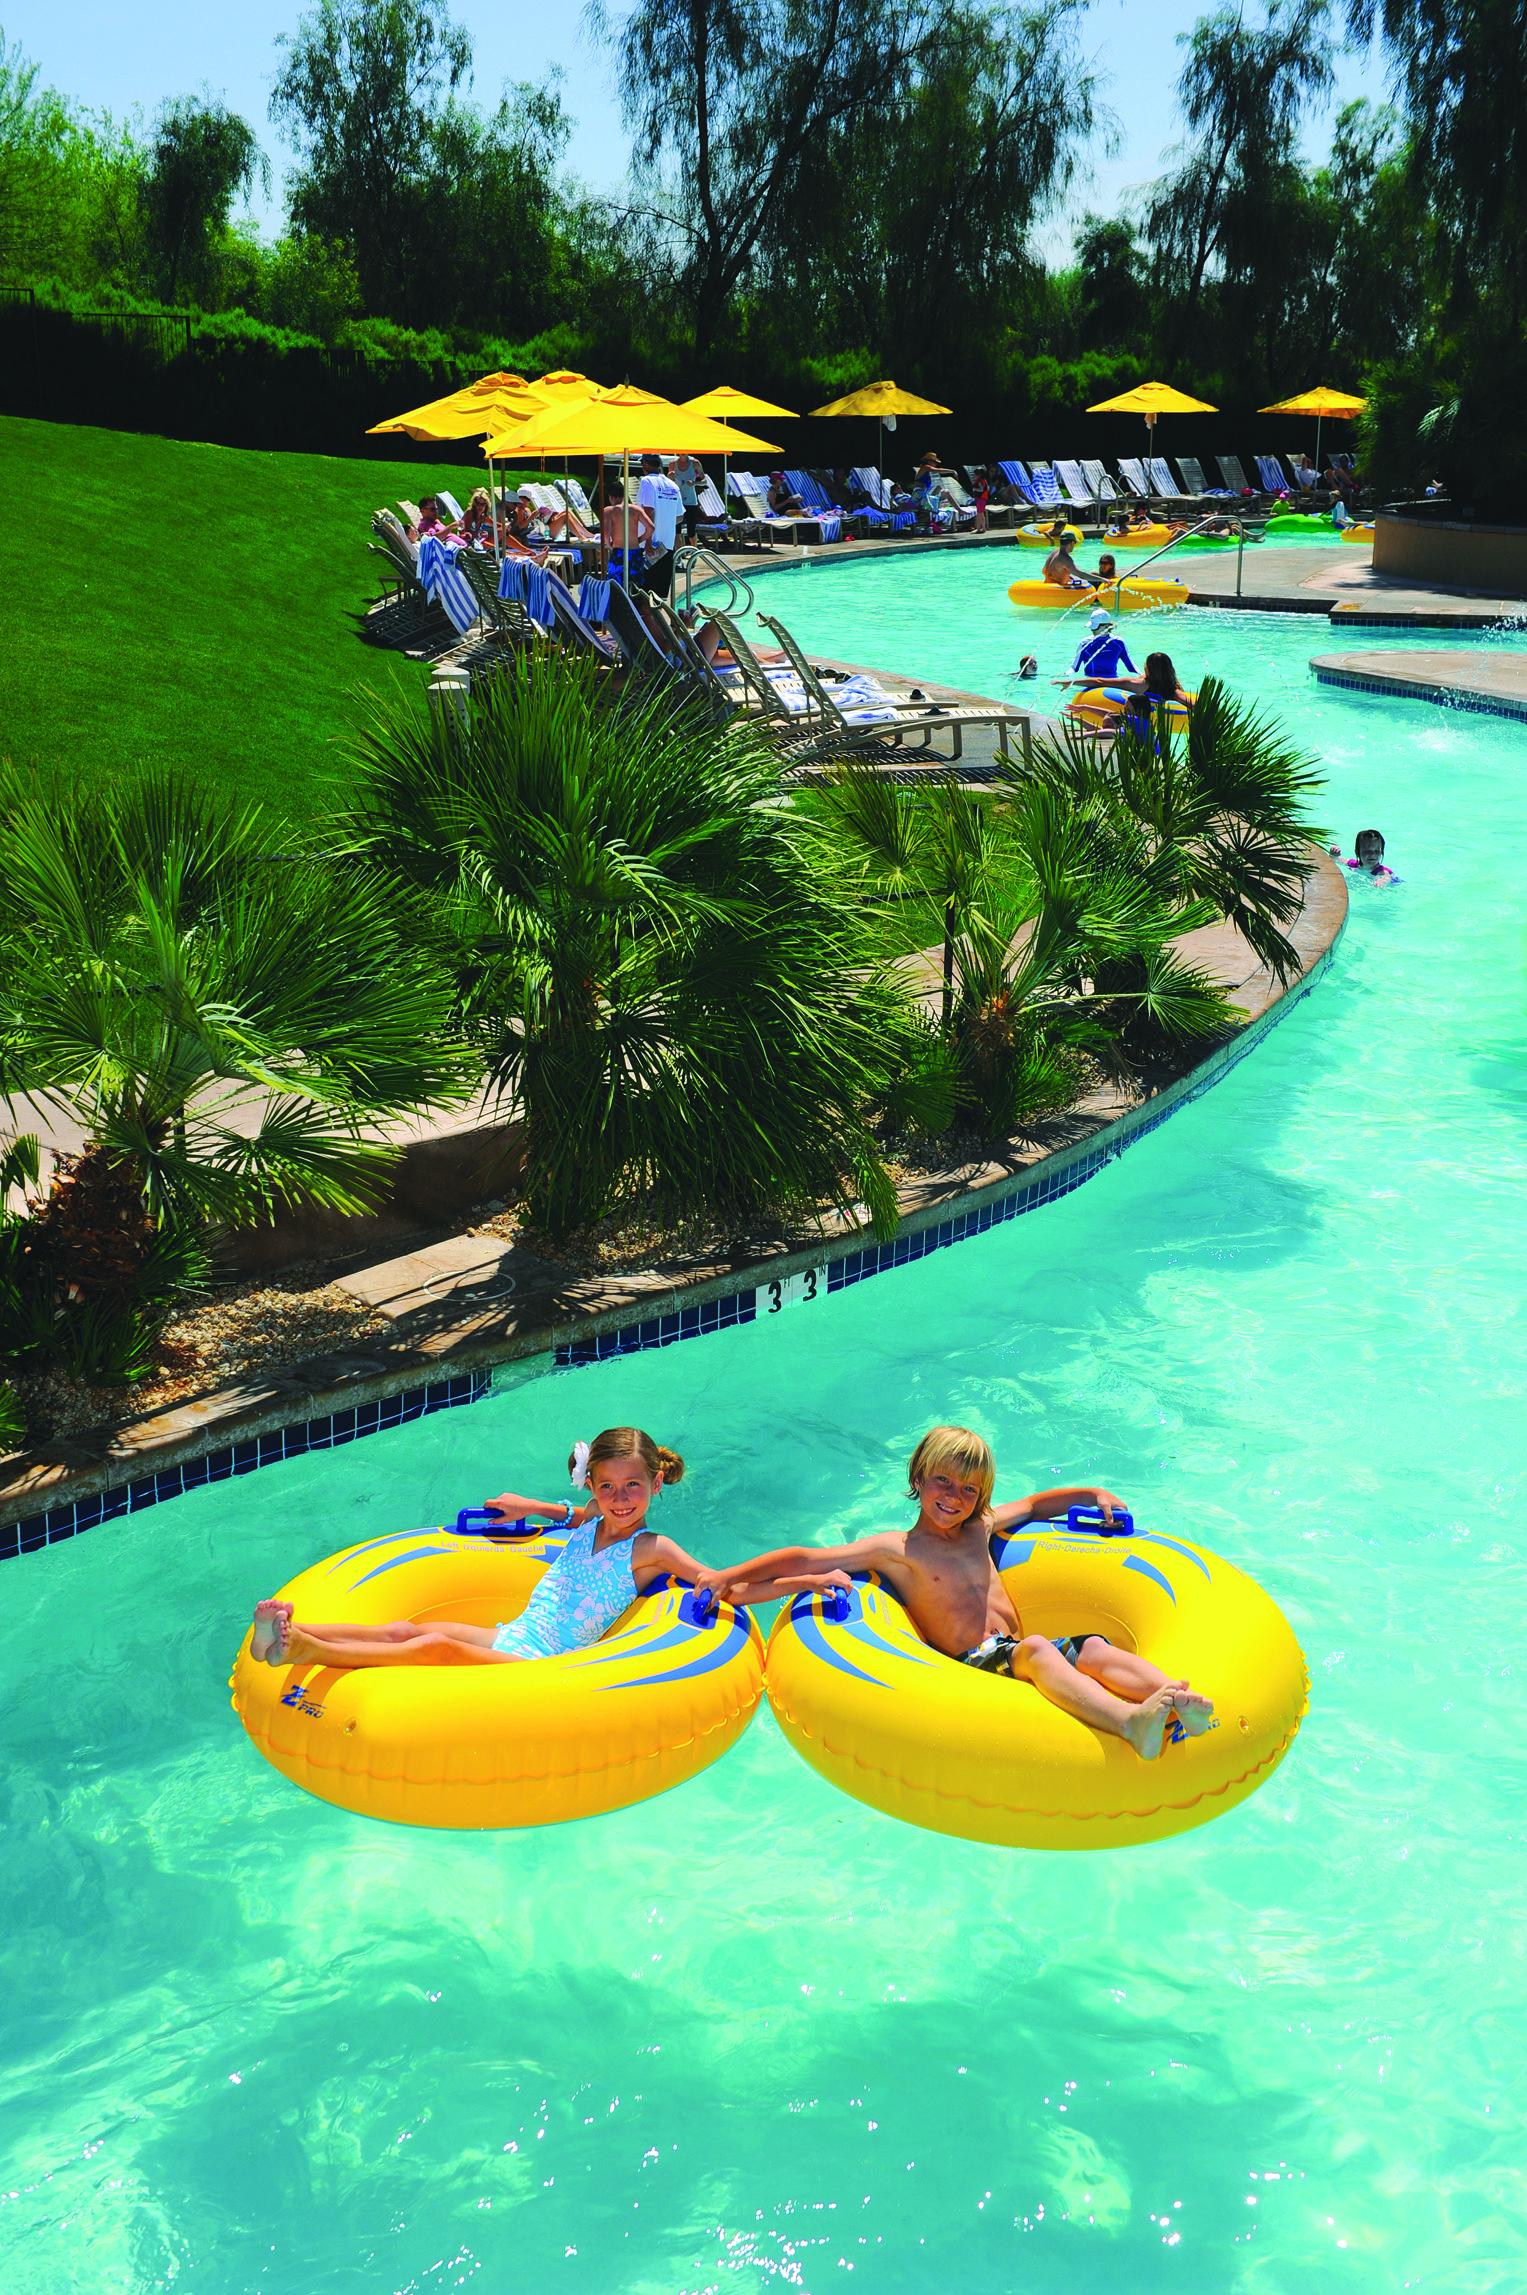 The Ultimate Summer Fun In Phoenix At JW Marriott Desert